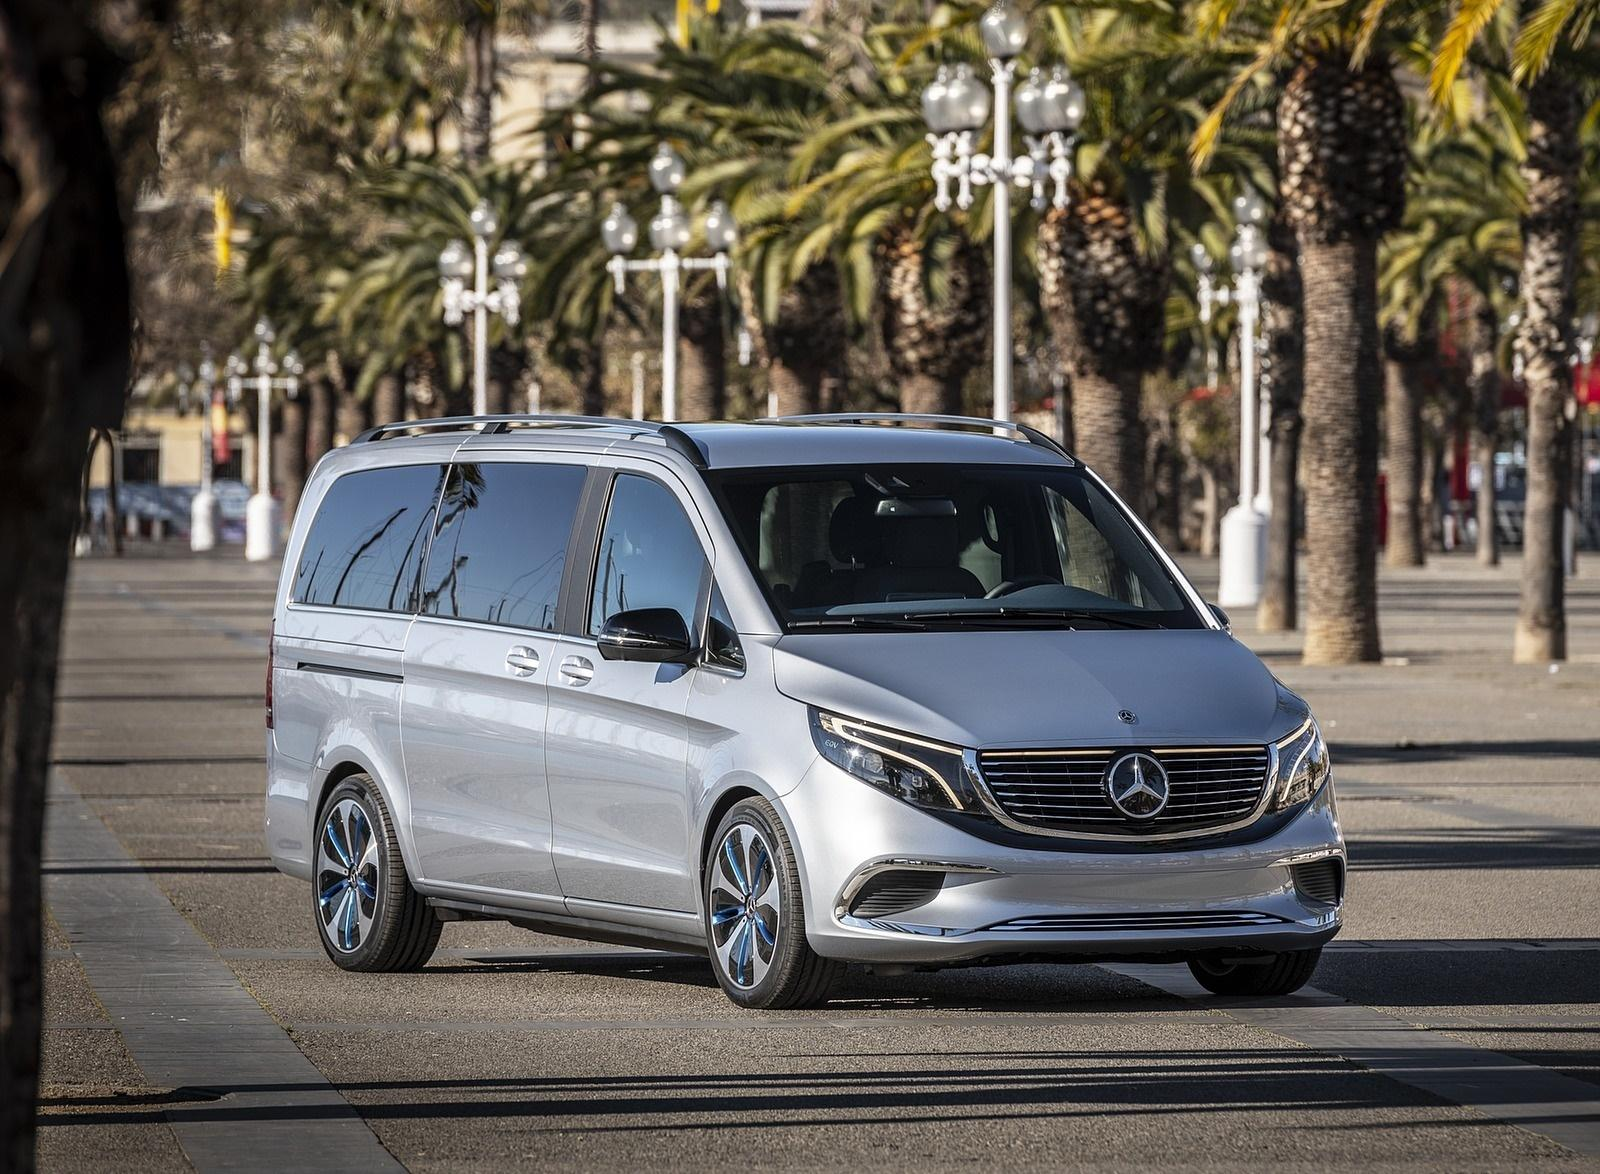 Mercedes-Benz представил минивэн EQV с электрическим двигателем (8)